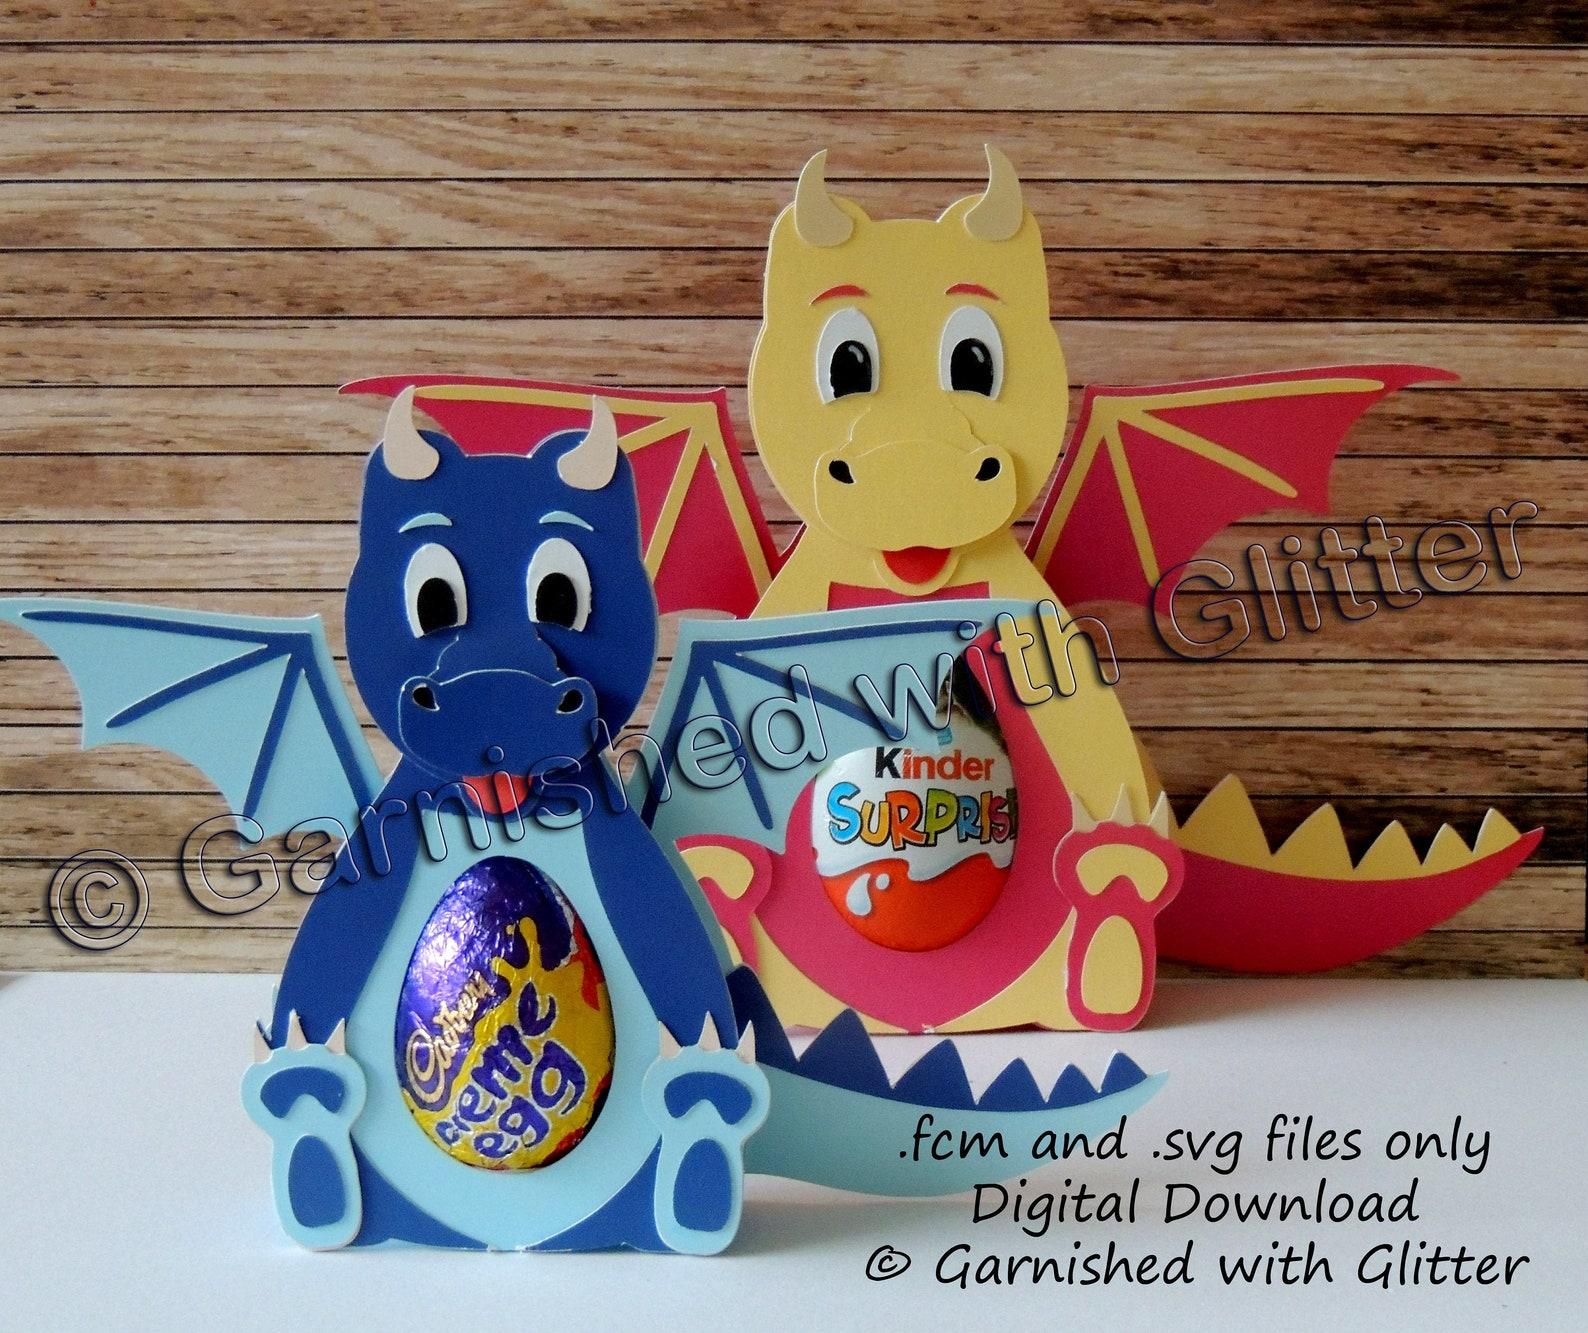 Dragon. Digital Download Cutting Files - fcm and svg. (Suitable for Kinder Surprise, Kinder JOY and Creme Egg - not included!)